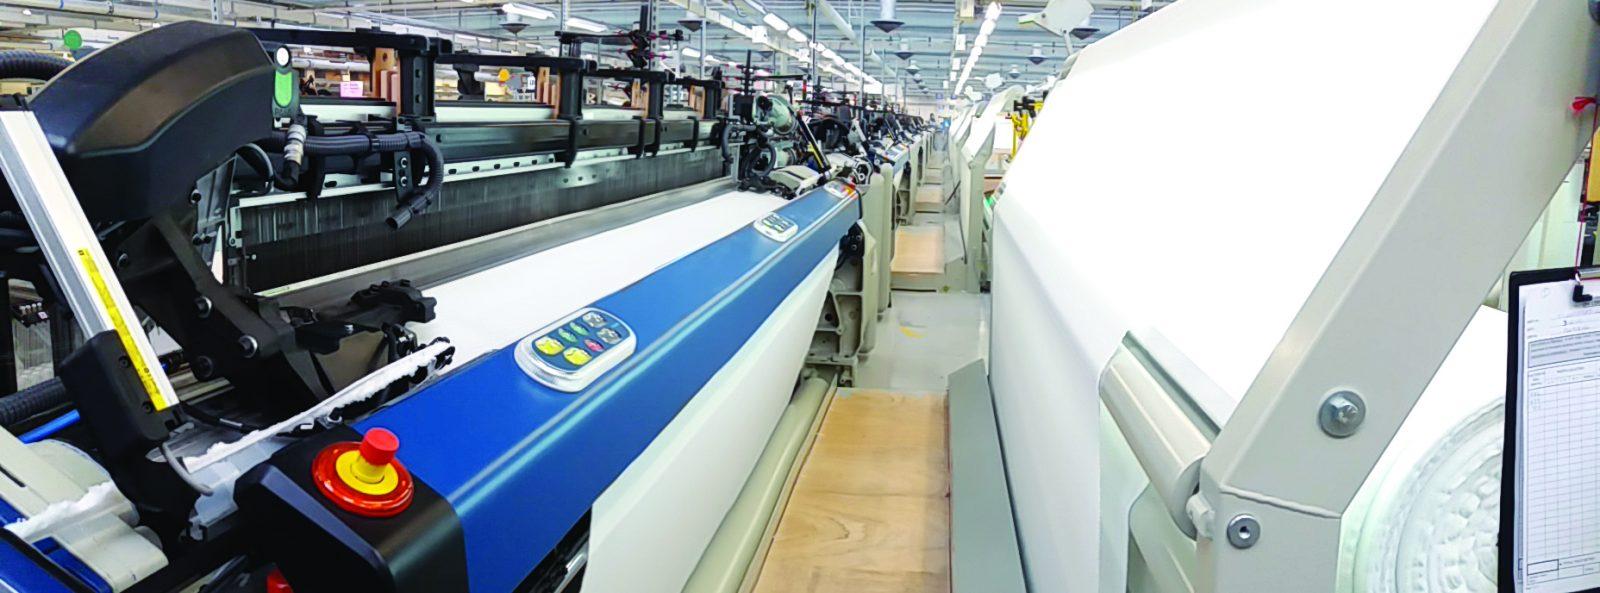 Production - Weaving